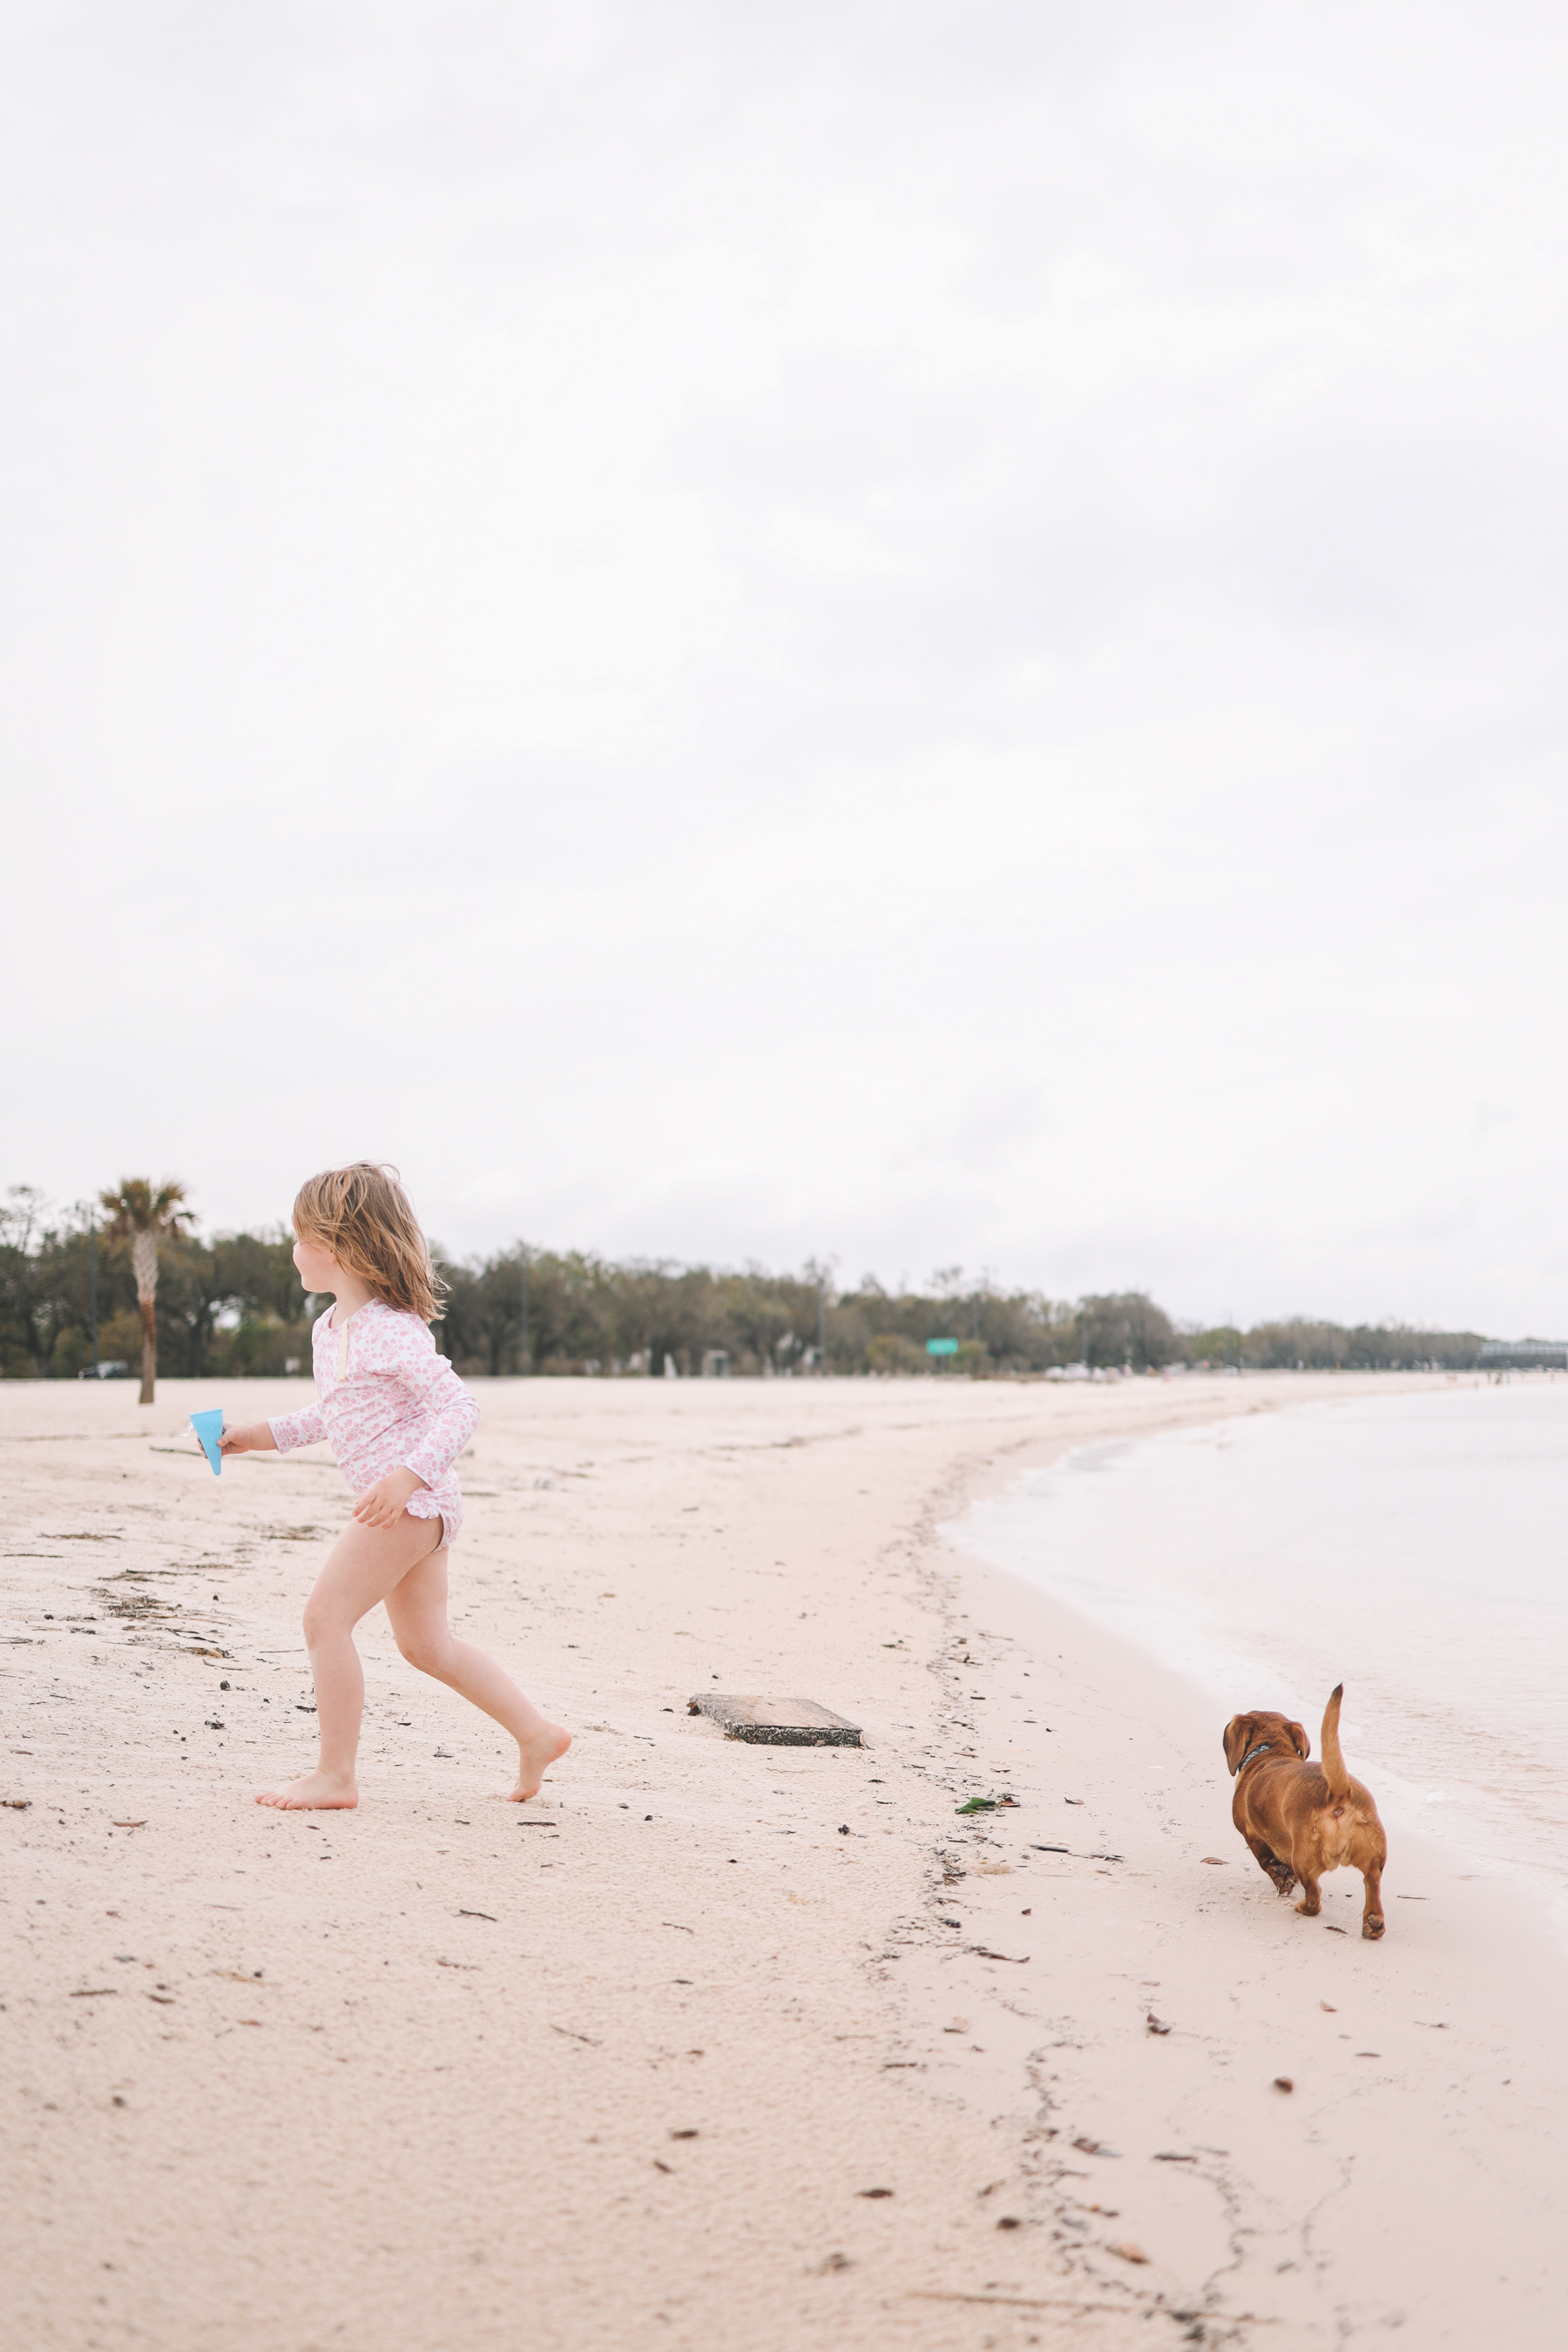 Gulf Beach Day